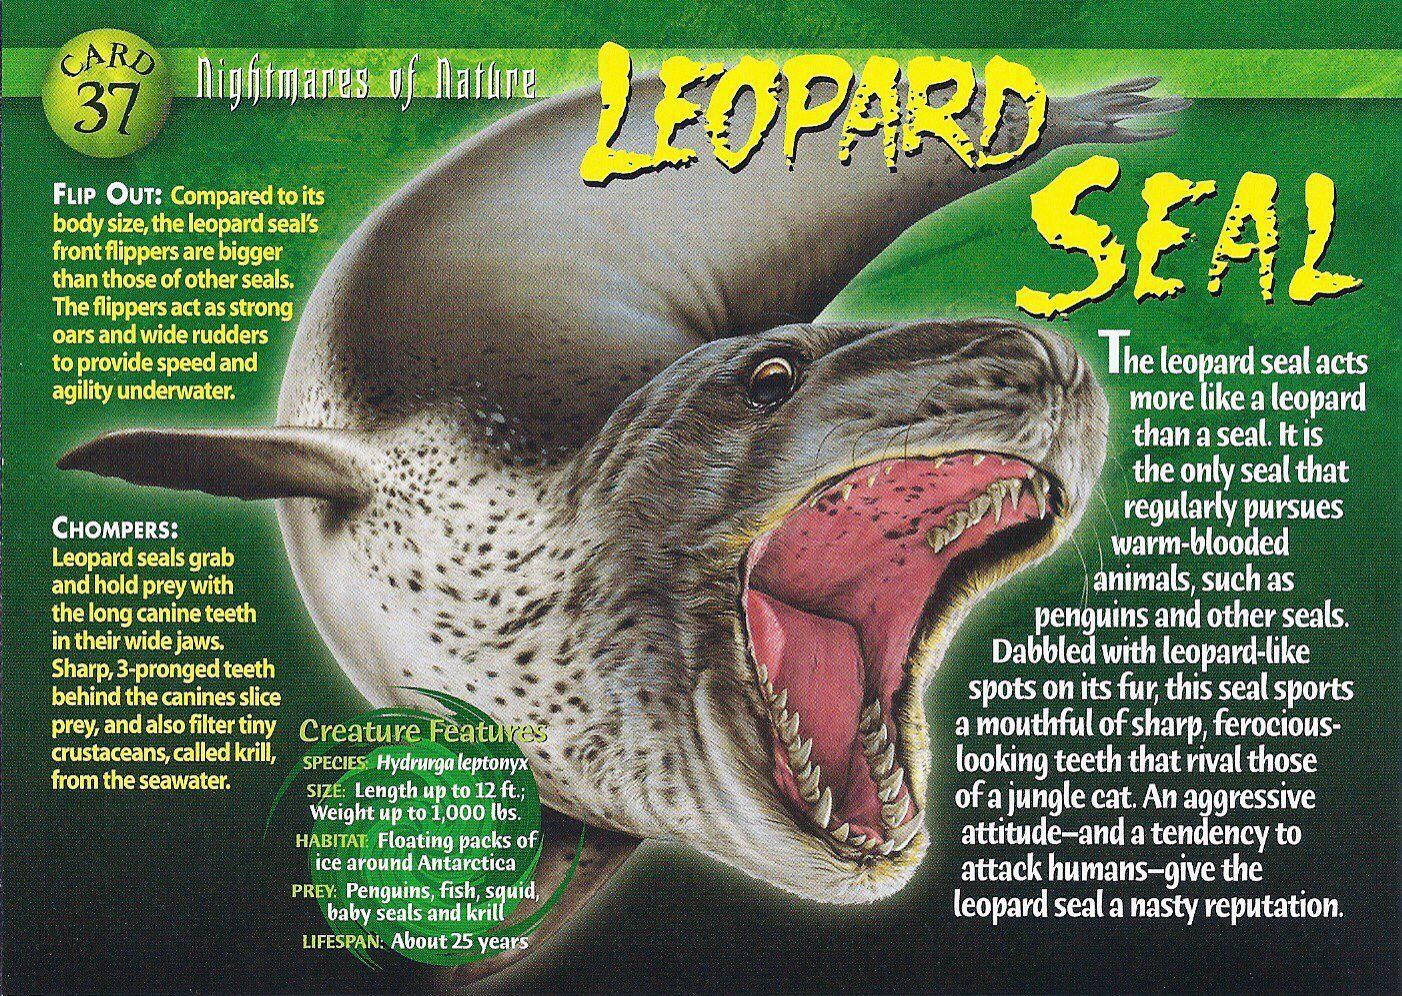 Leopard Seal fact sheet | LETHAL LEOPARD SEALS | Pinterest